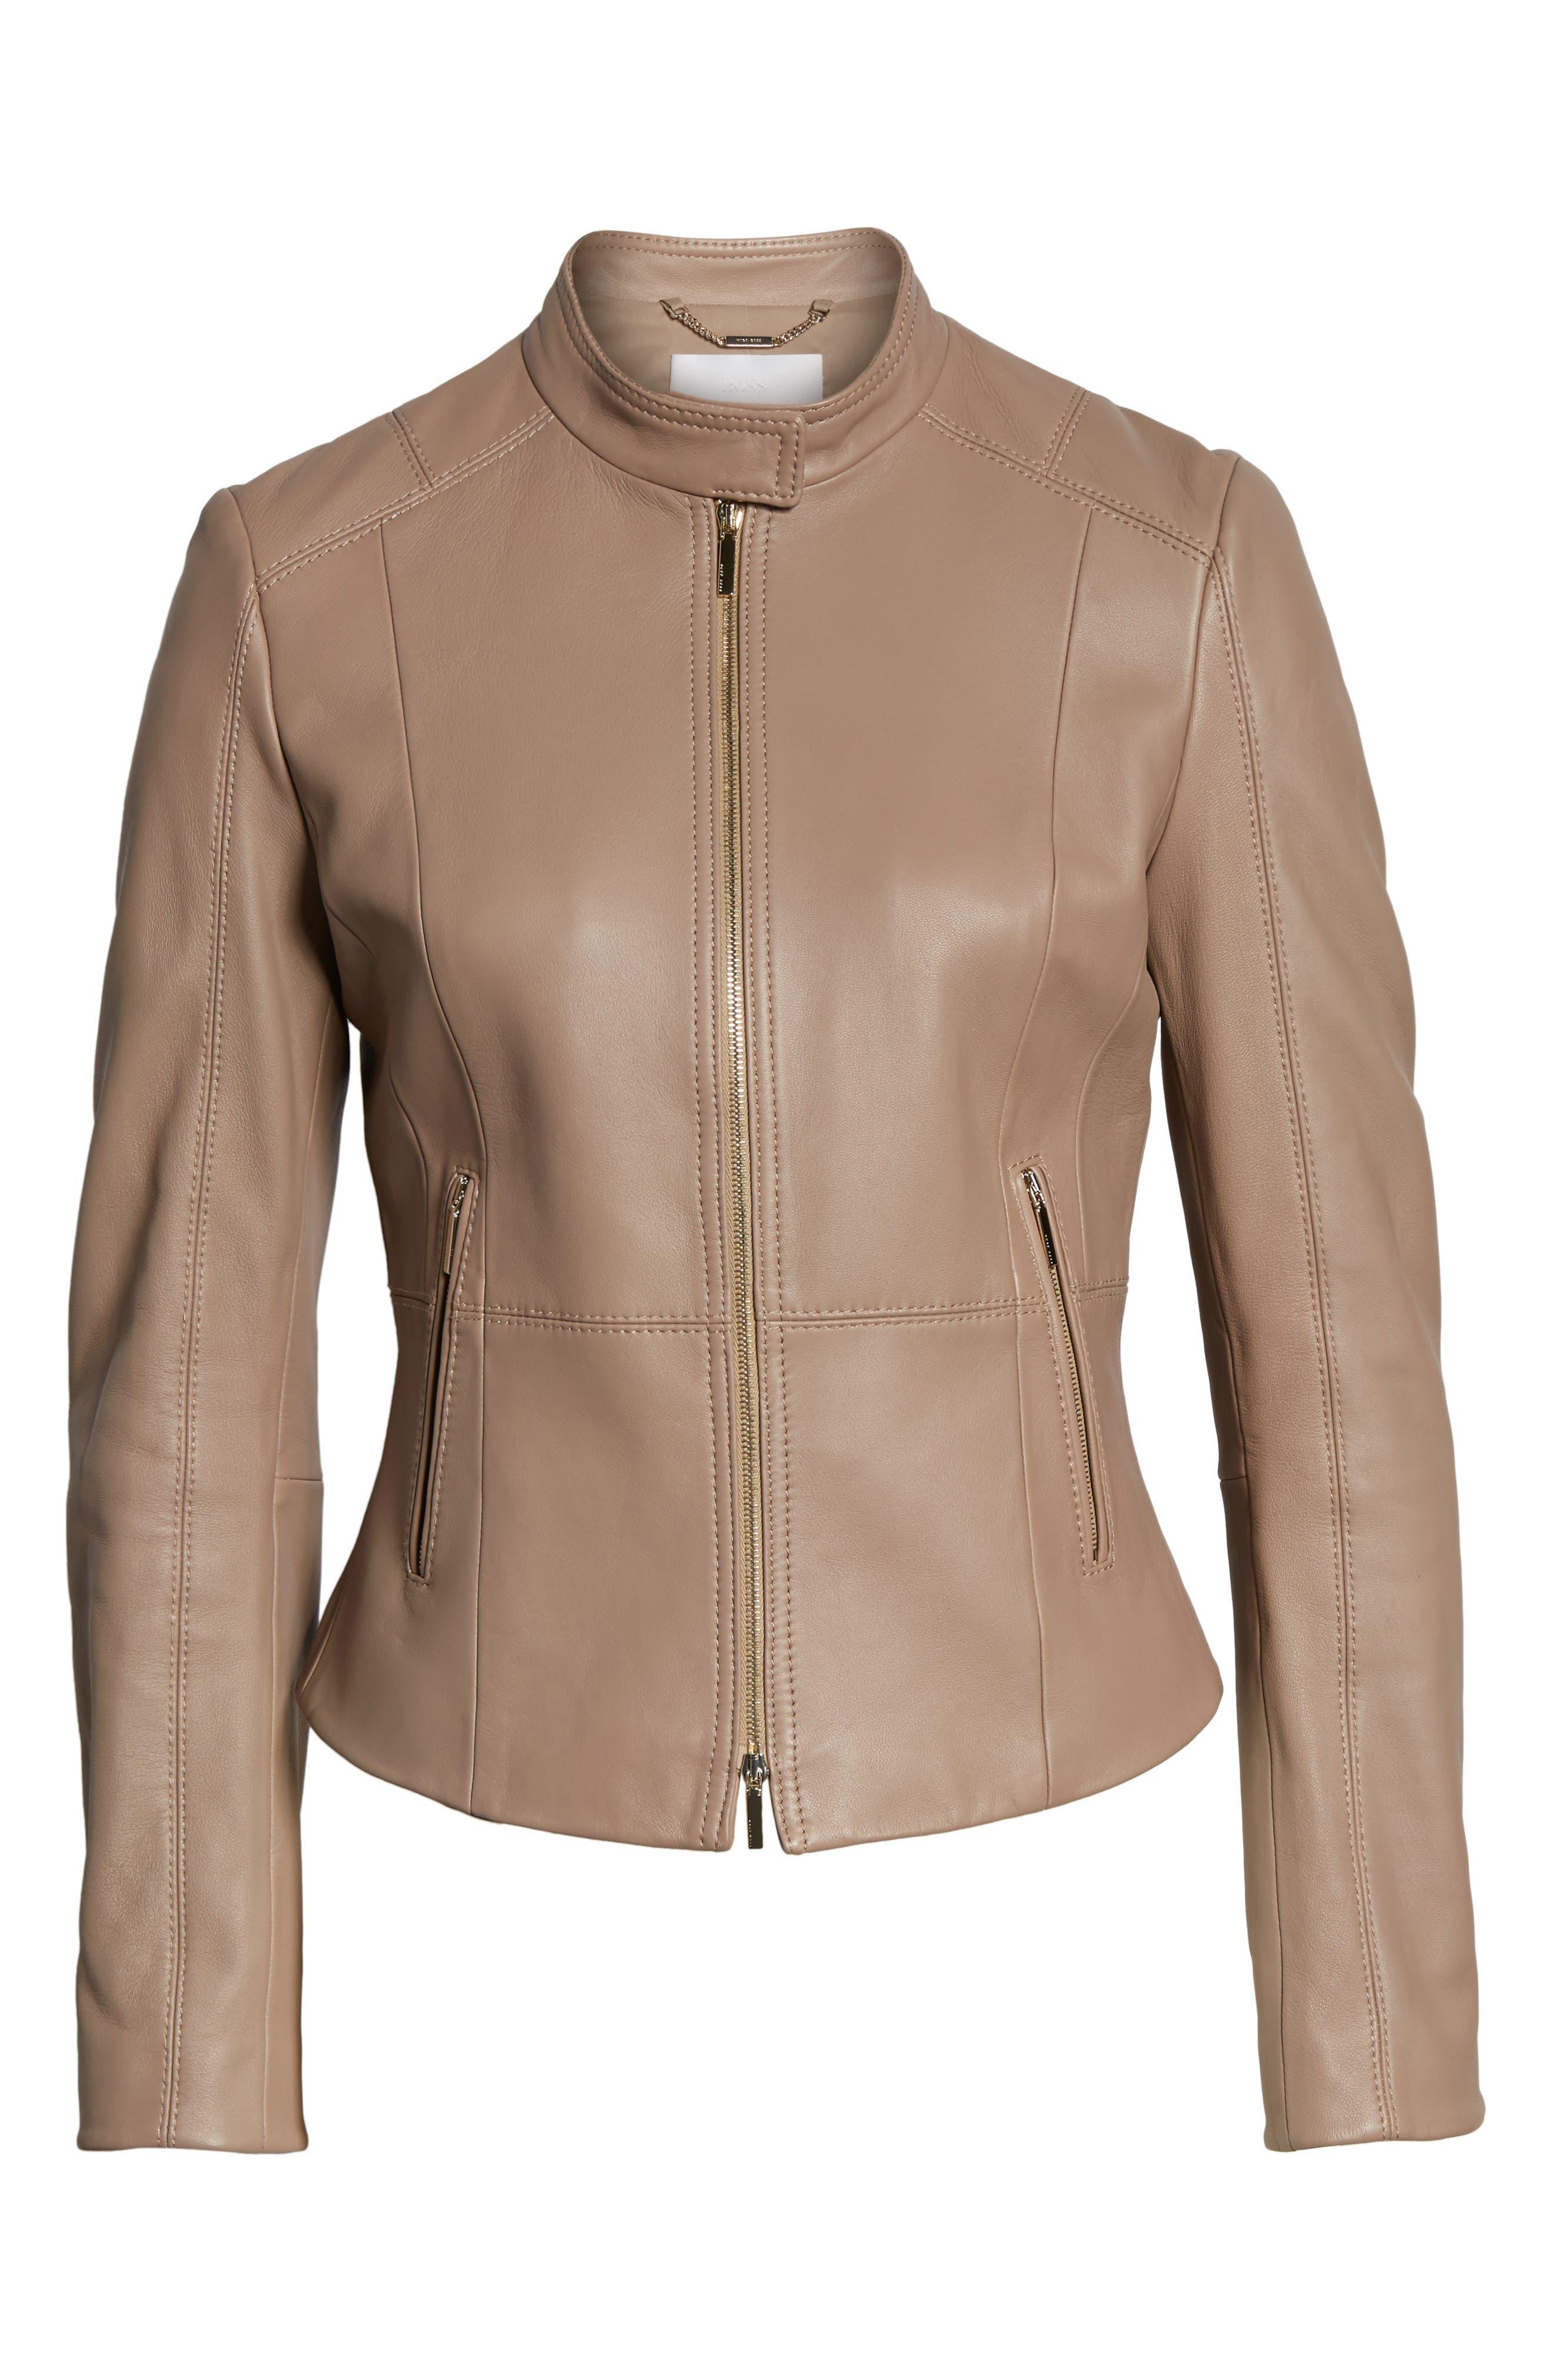 Sammonaie Leather Jacket,                             Alternate thumbnail 8, color,